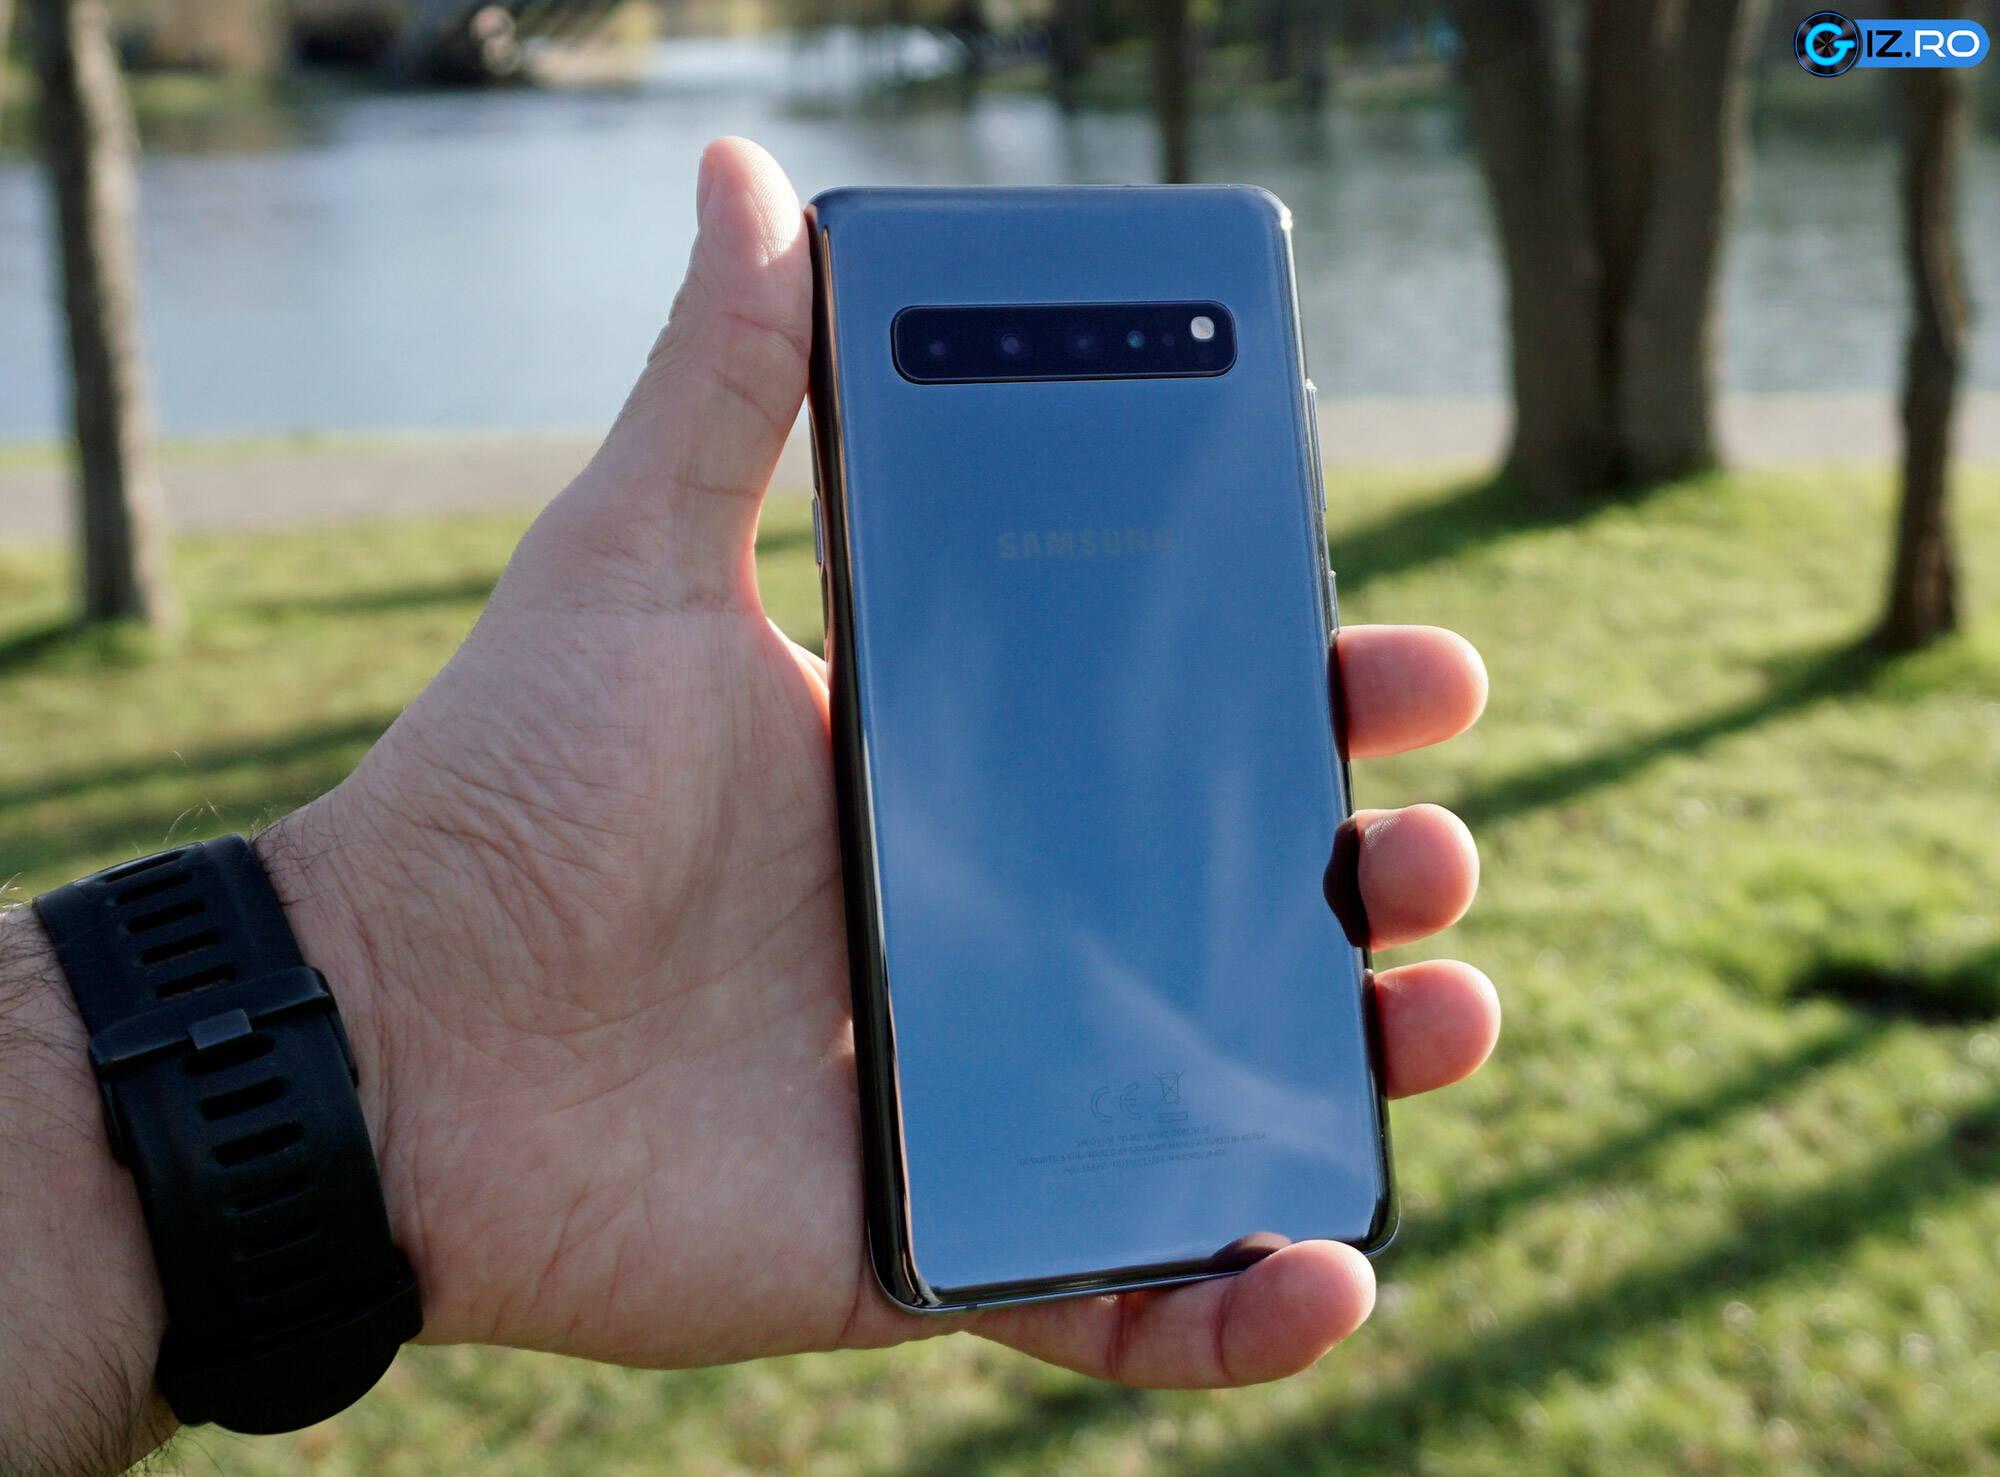 Samsung Galaxy S10 5G spate